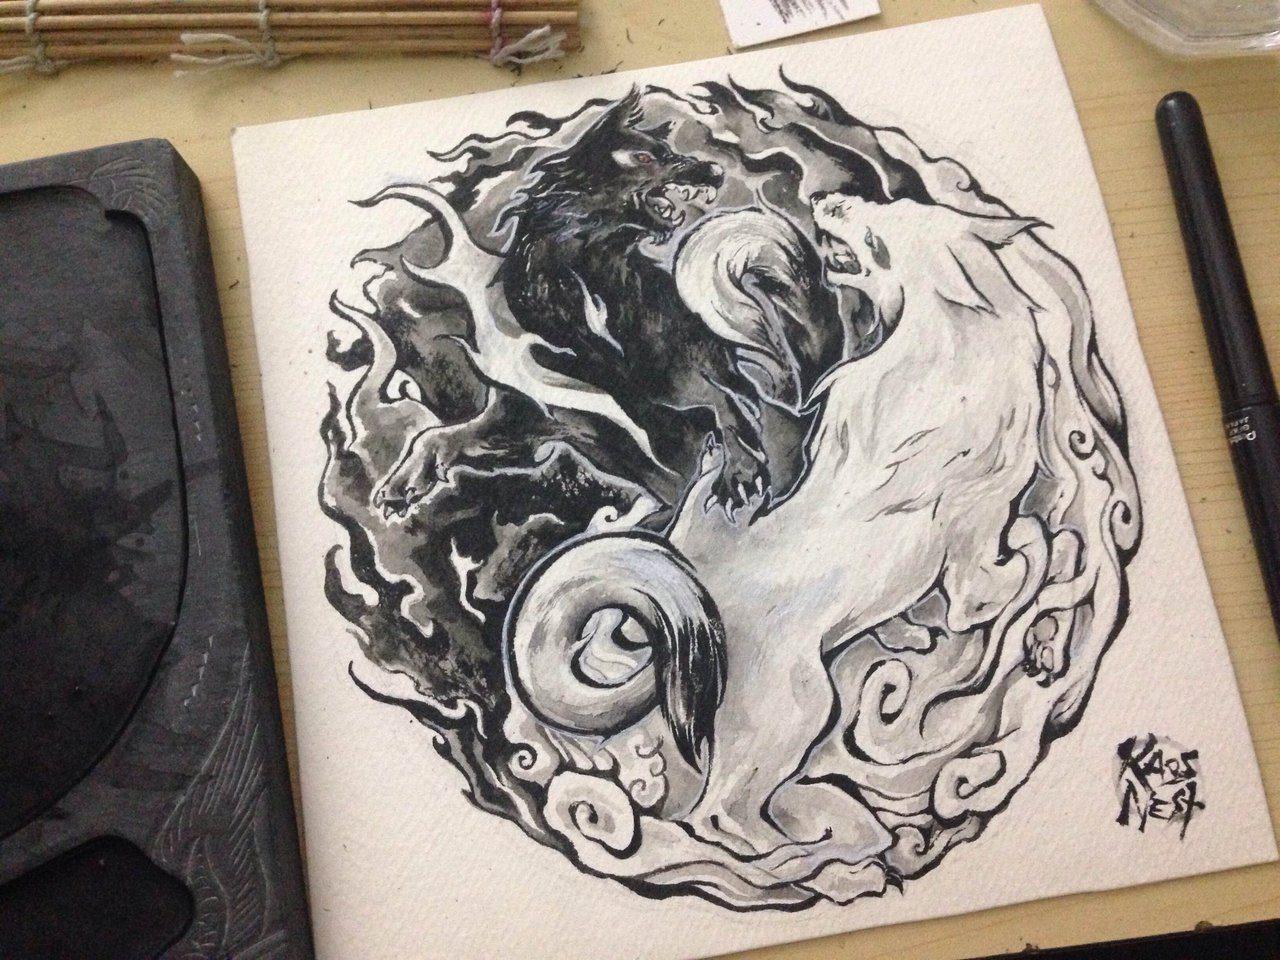 yin_yang_wolves_tattoo_design_by_kaos_nest-d9tnbr5.jpg